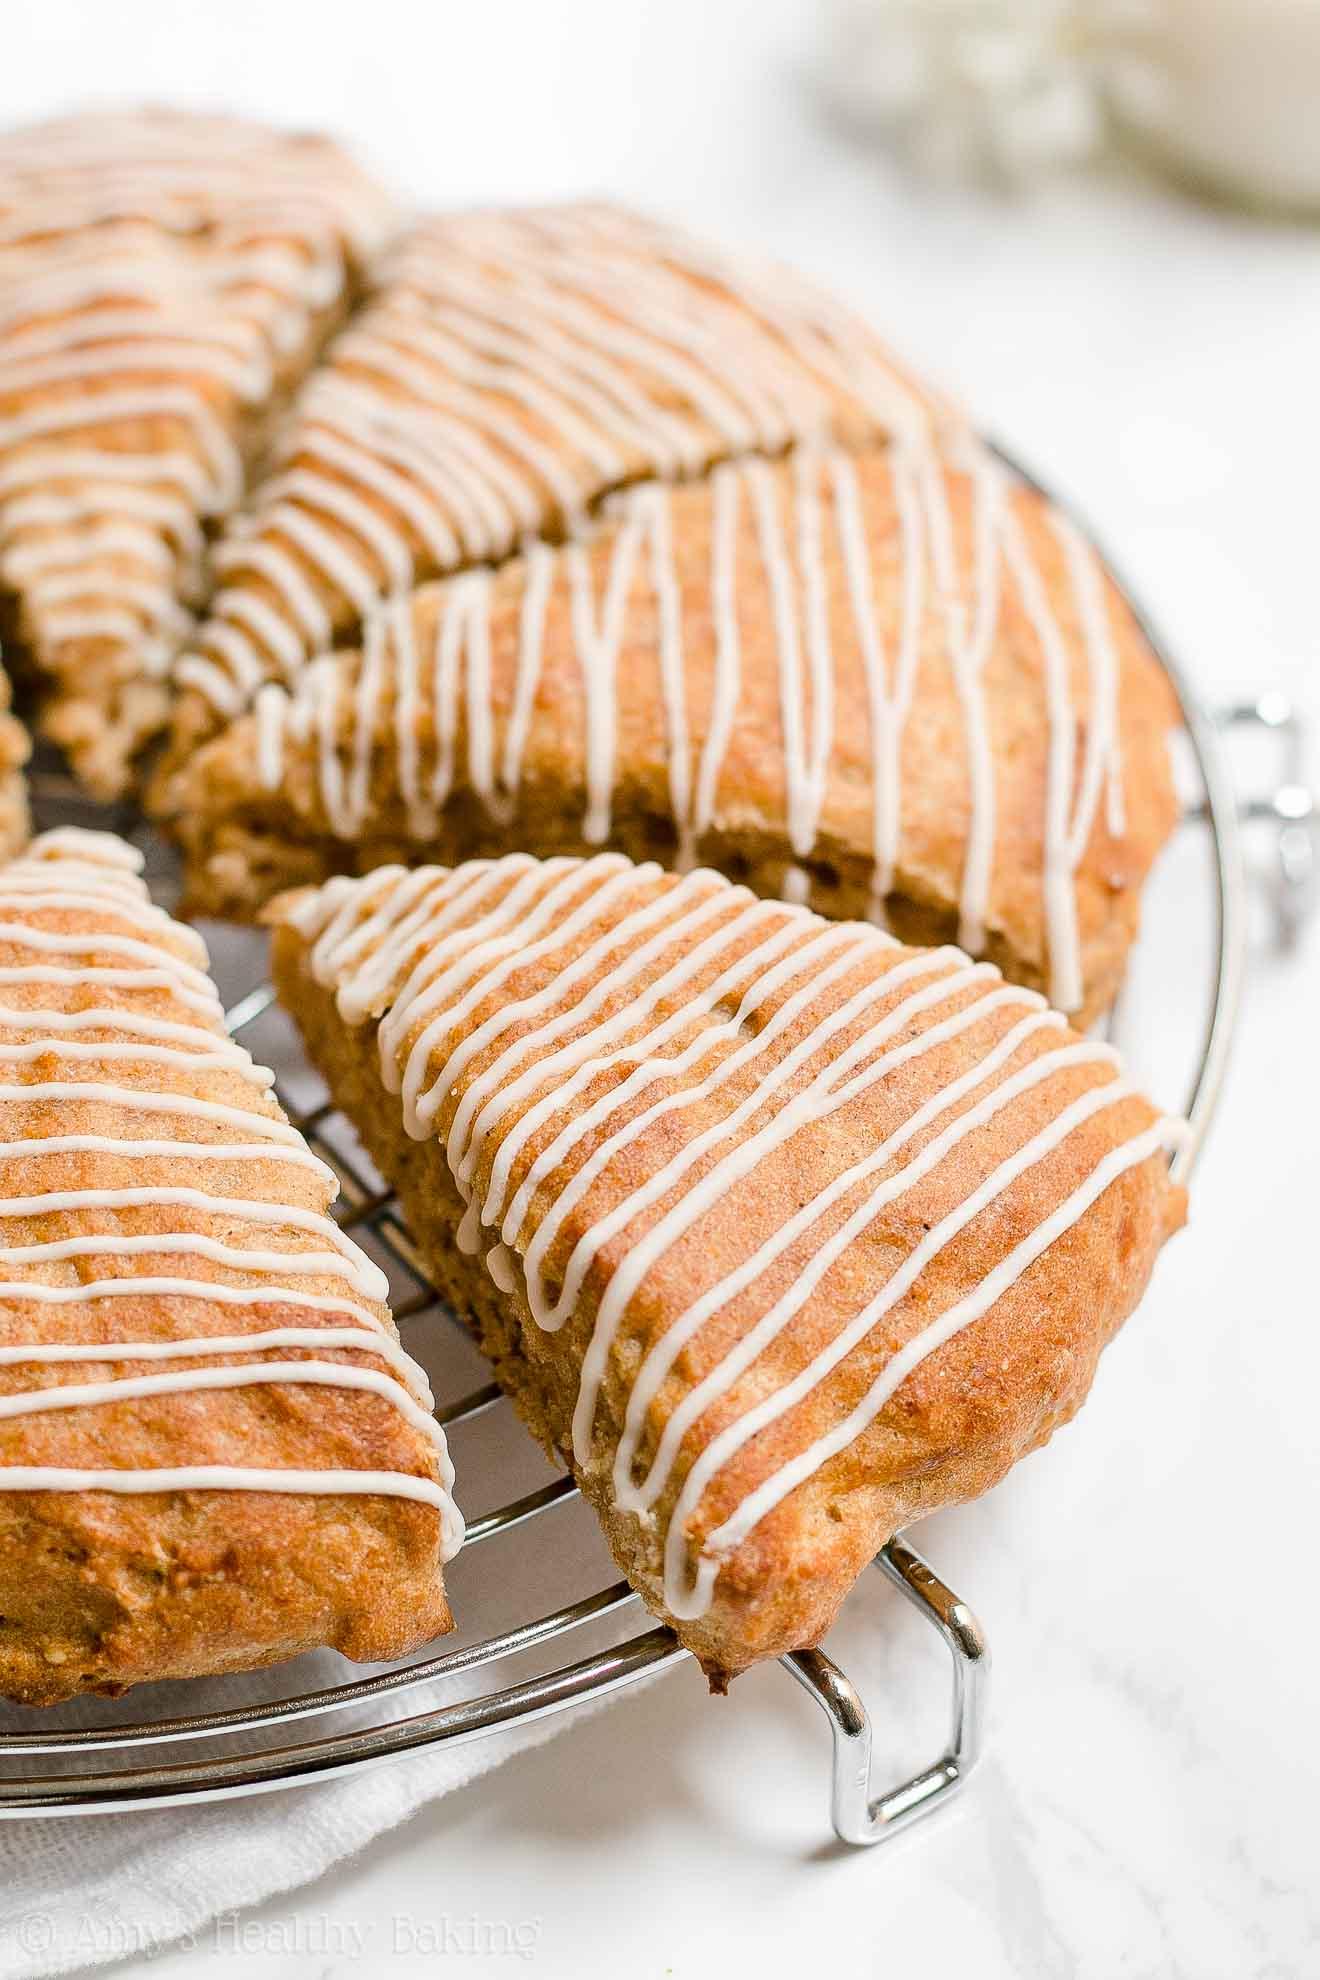 Moist Healthy Whole Wheat (Wholemeal) Banana Buttermilk Scones